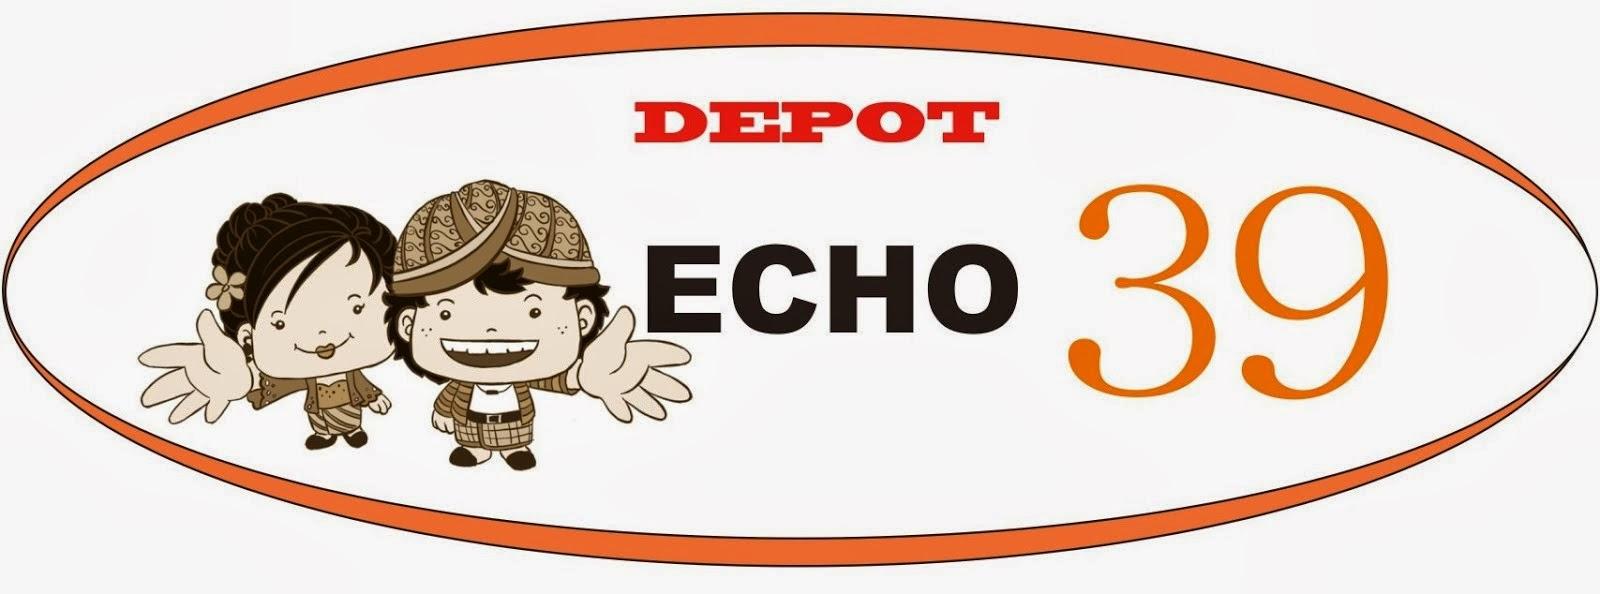 Depot Echo39